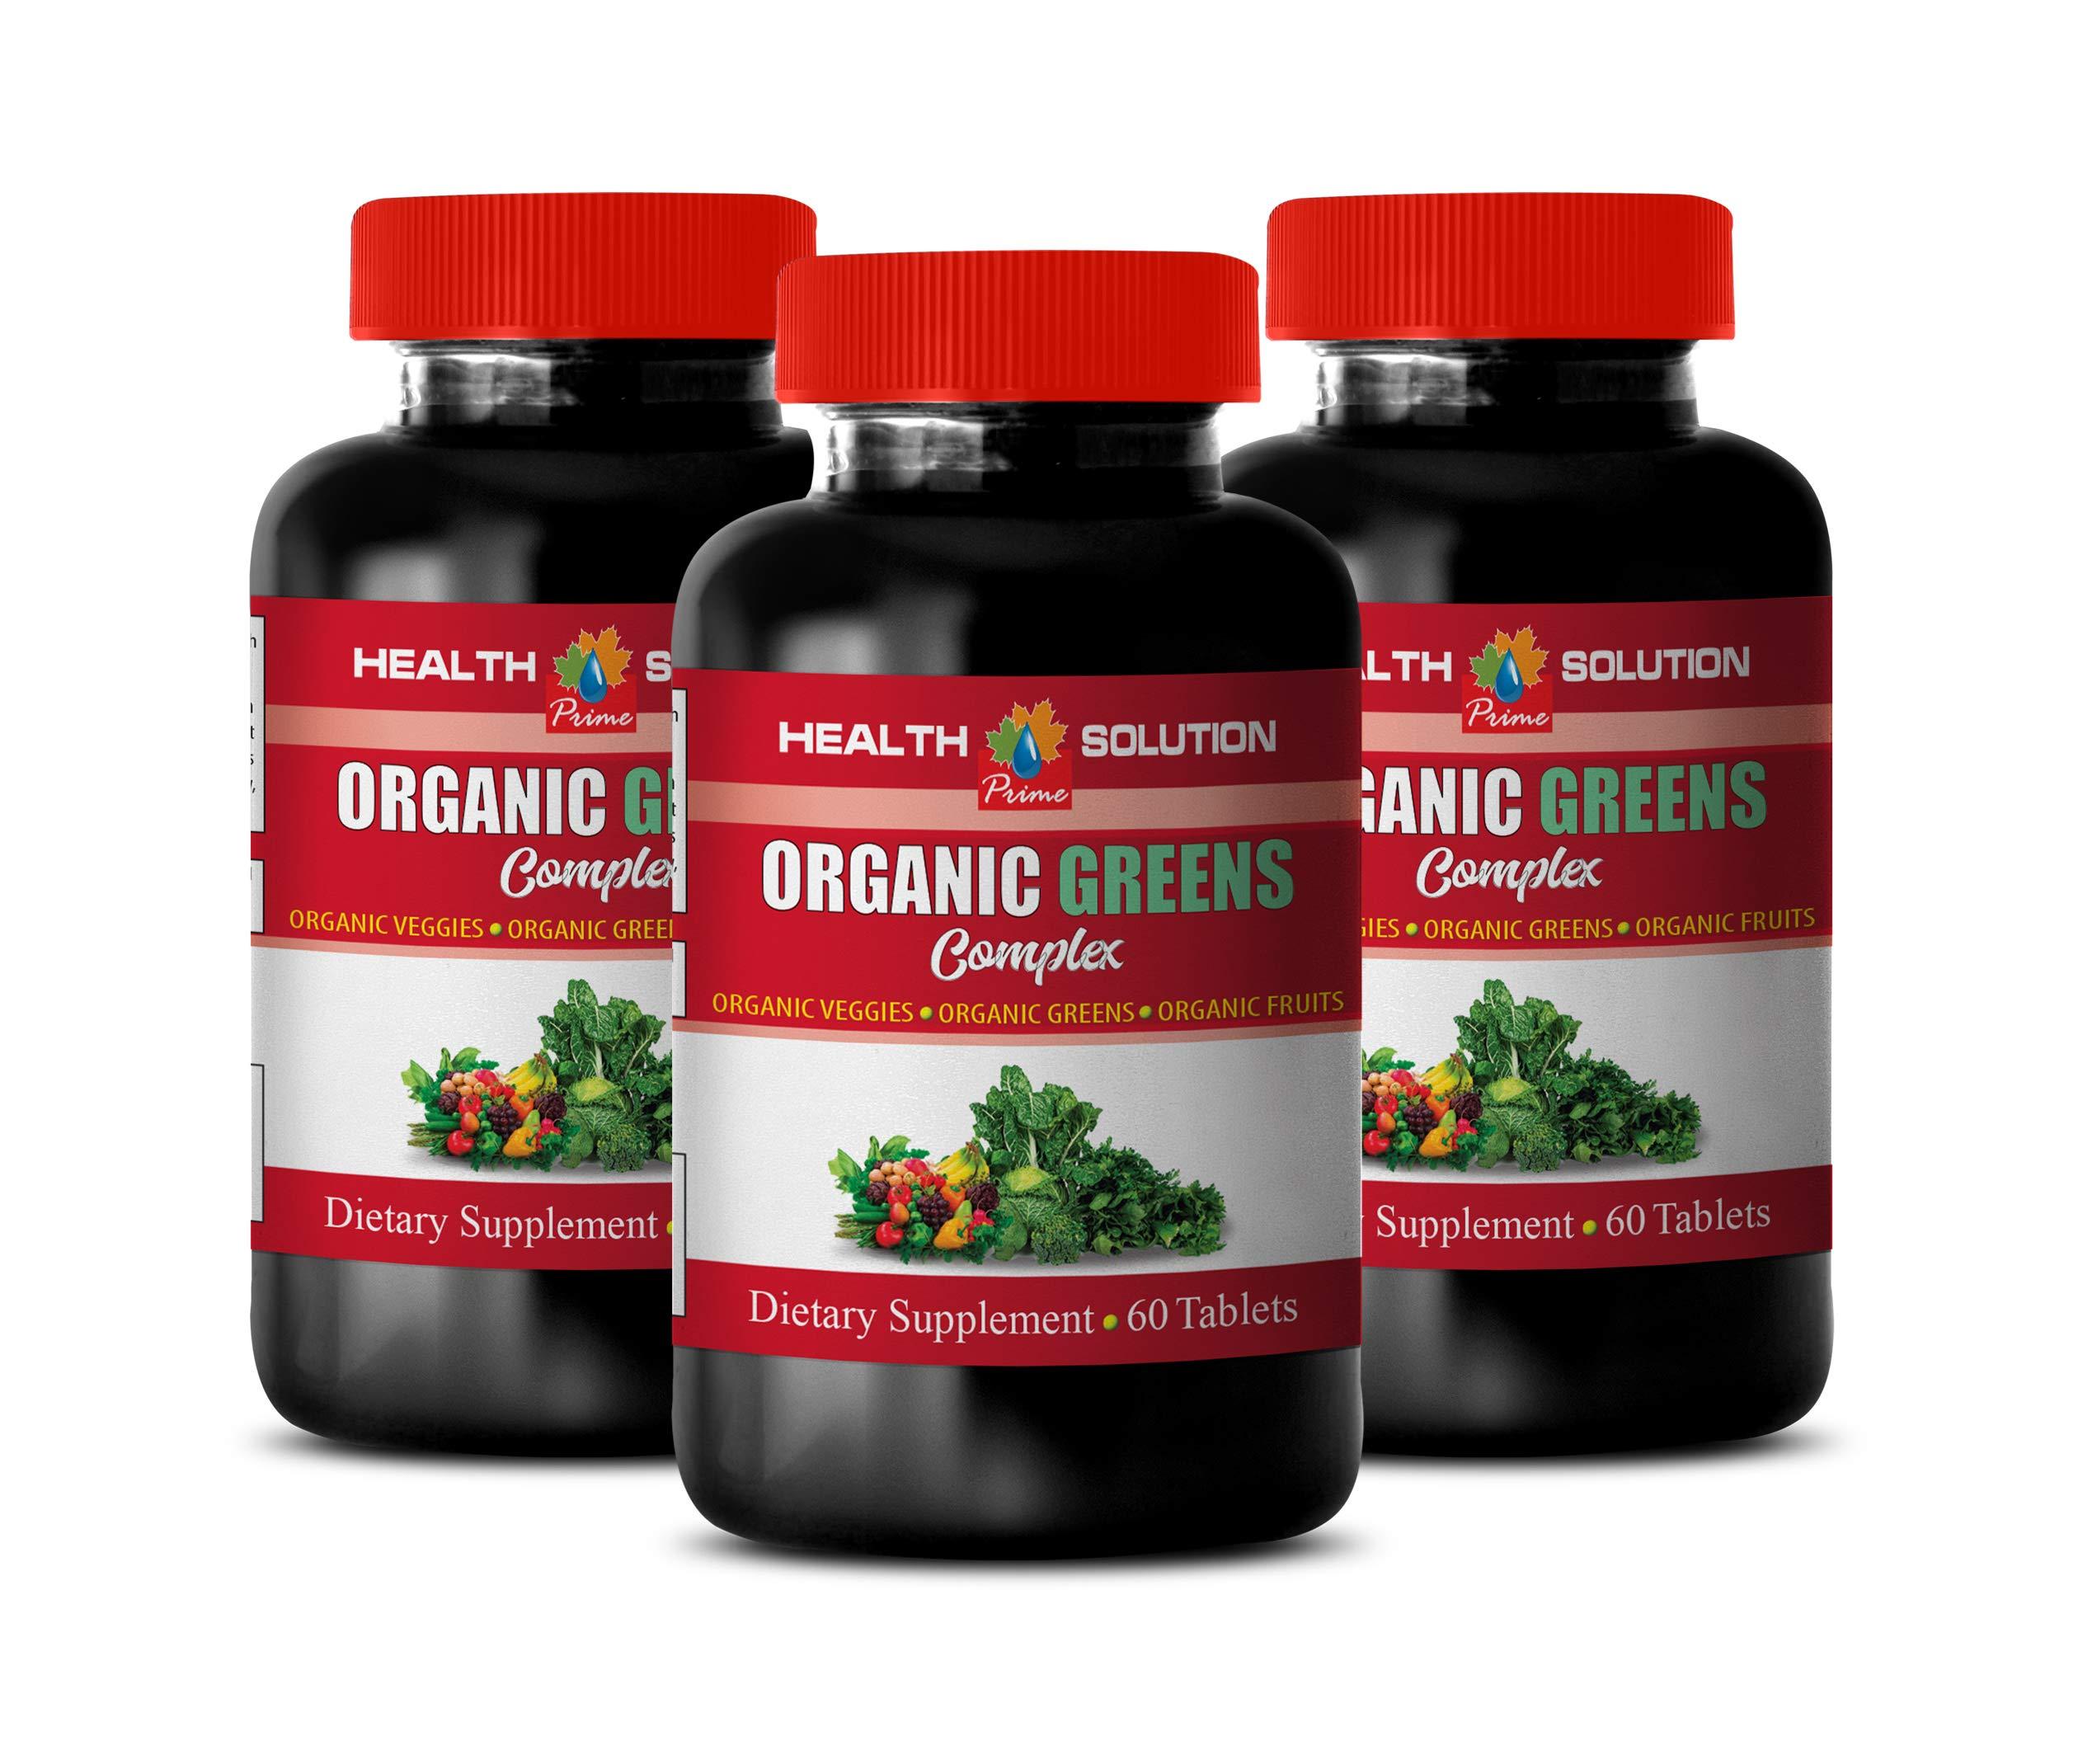 Immune System Pills Organic - Greens Organic Complex - Dietary Supplement - Raspberry Vitamins - 3 Bottles 180 Tablets